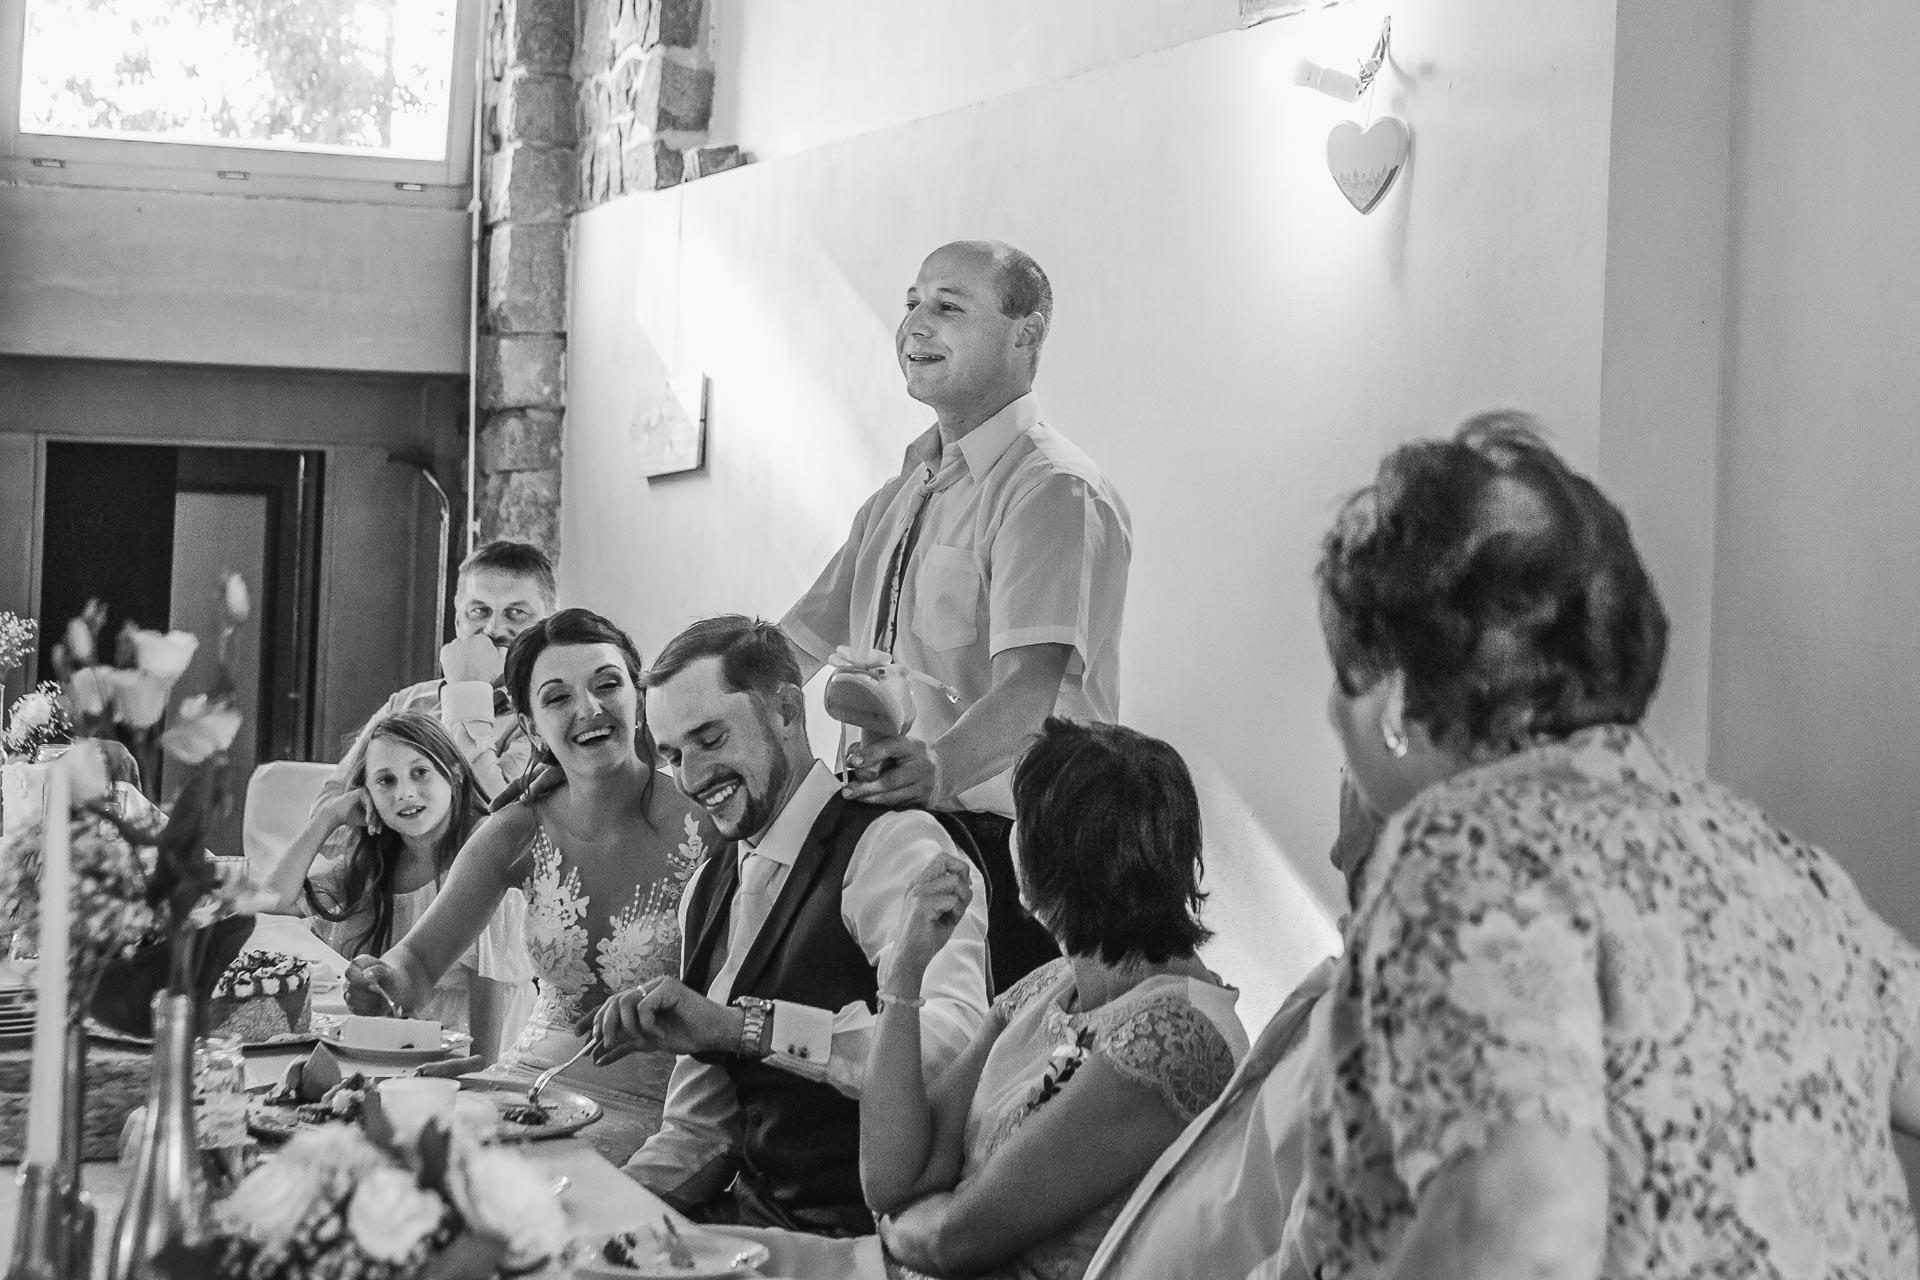 svatební-fotograf-wedding-svatebni-video-orlík-vltava-kostel-statek-stodola-boho-svatba-Beautyfoto-477